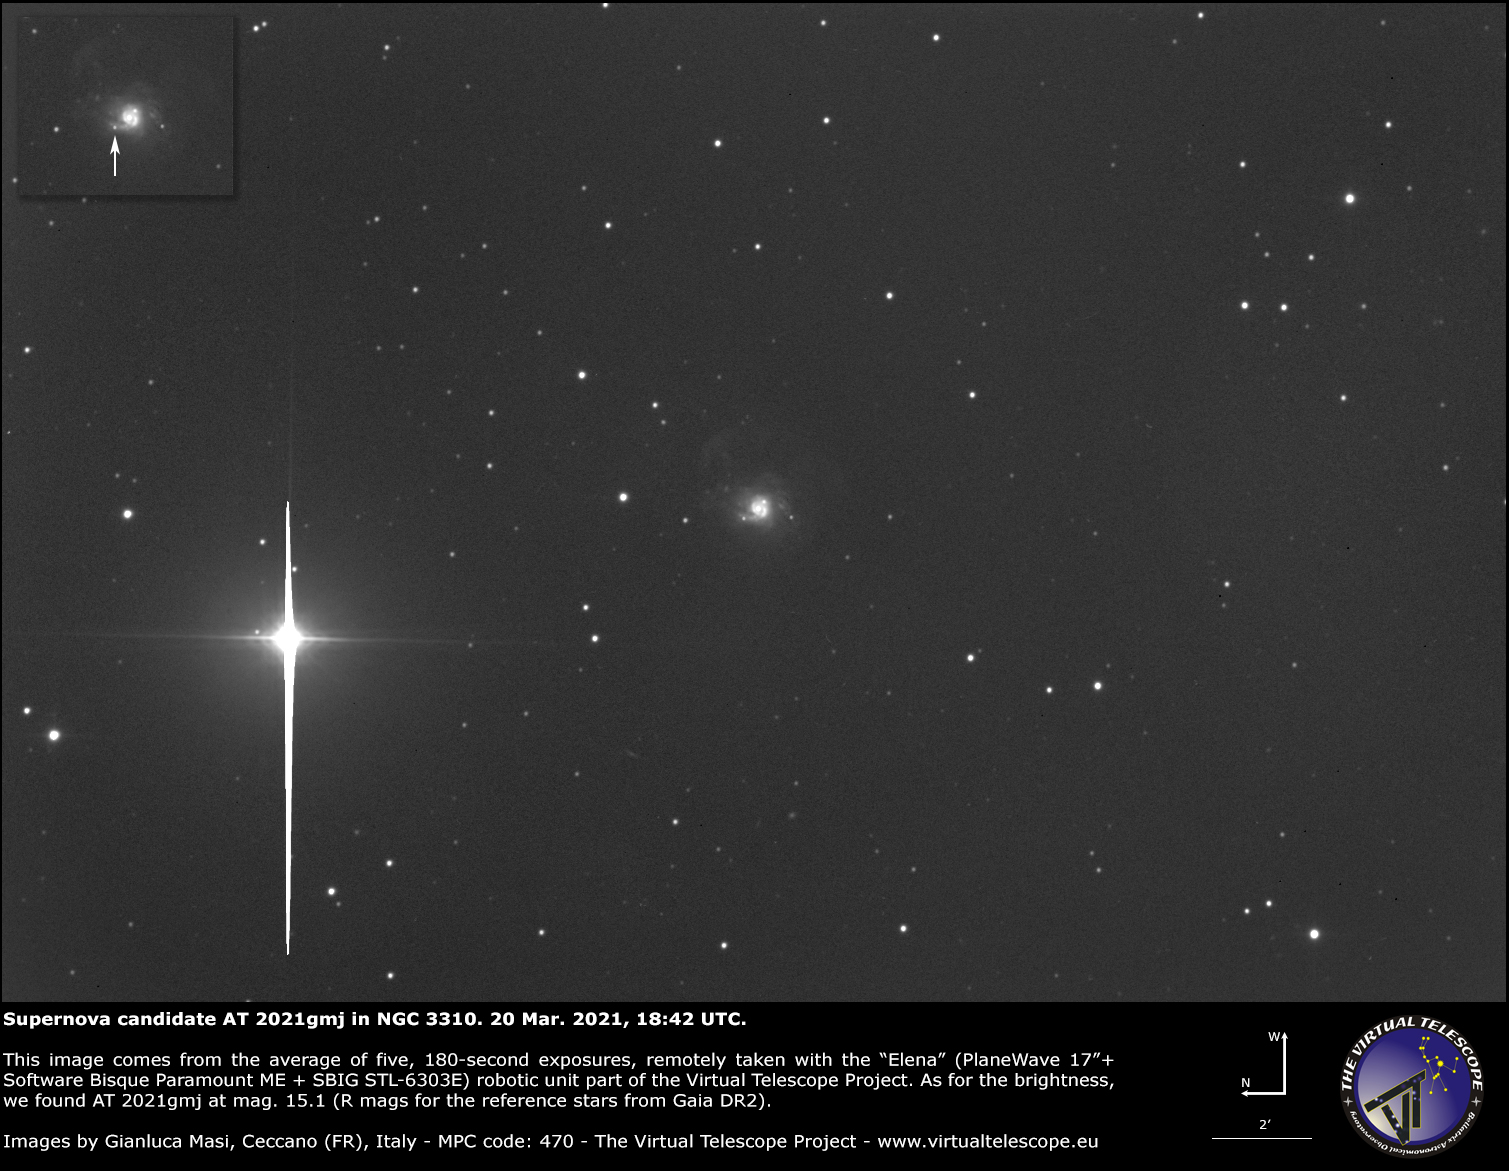 Supernova SN 2021gmj (was AT 2021gmj) in NGC 3310 galaxy: 20 Mar. 2021.